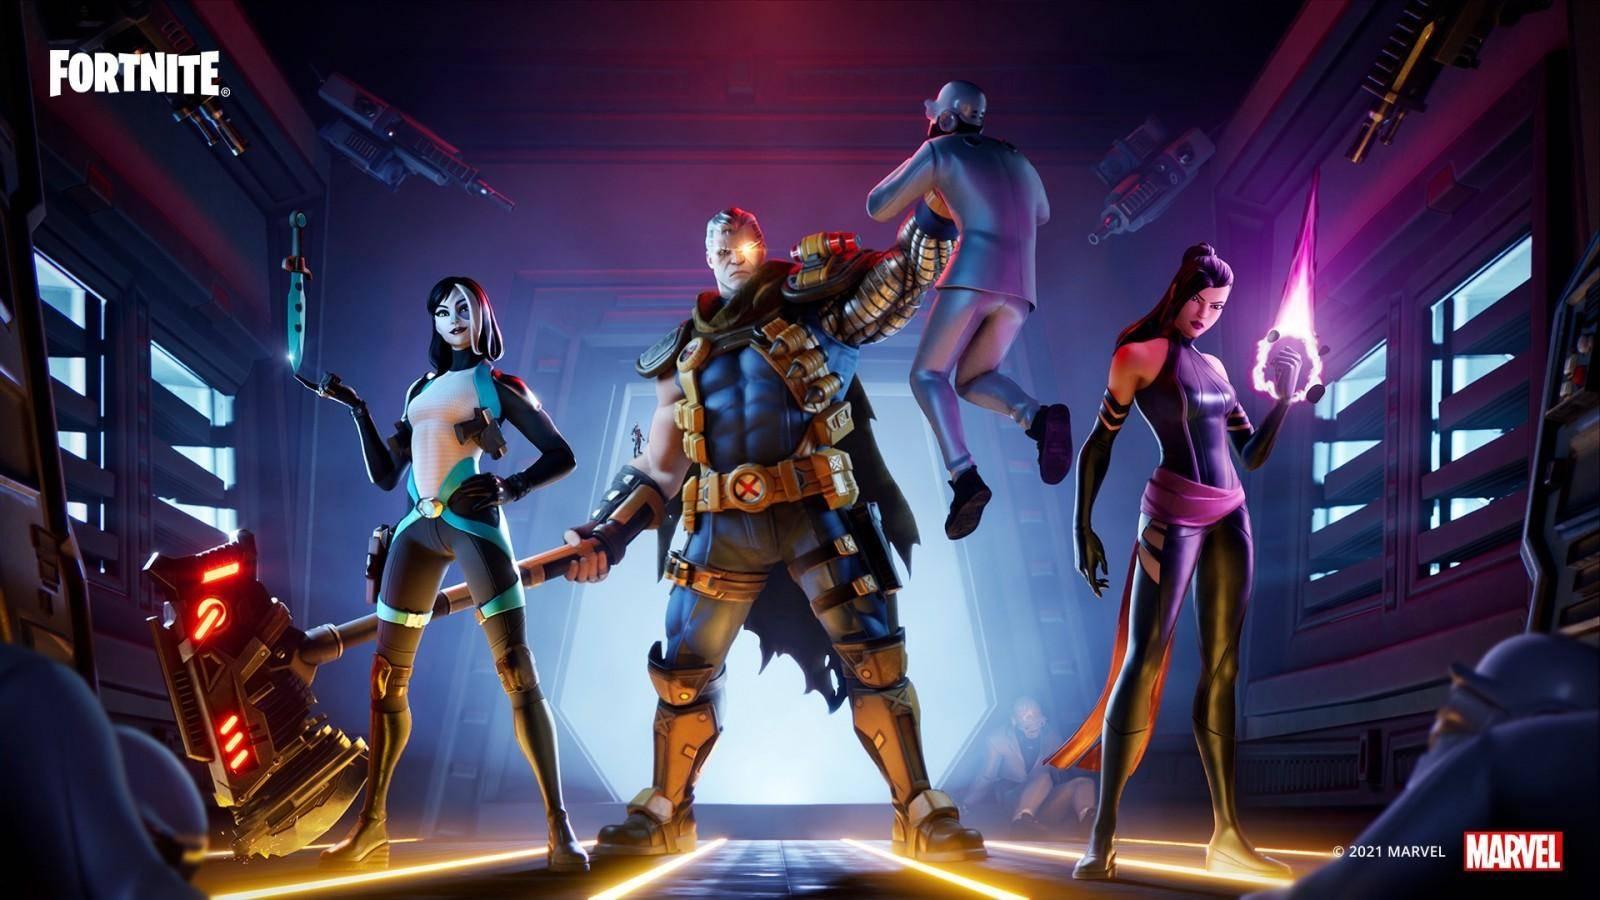 Fortnite, Ant-man, Cable, Psylocke, Domino